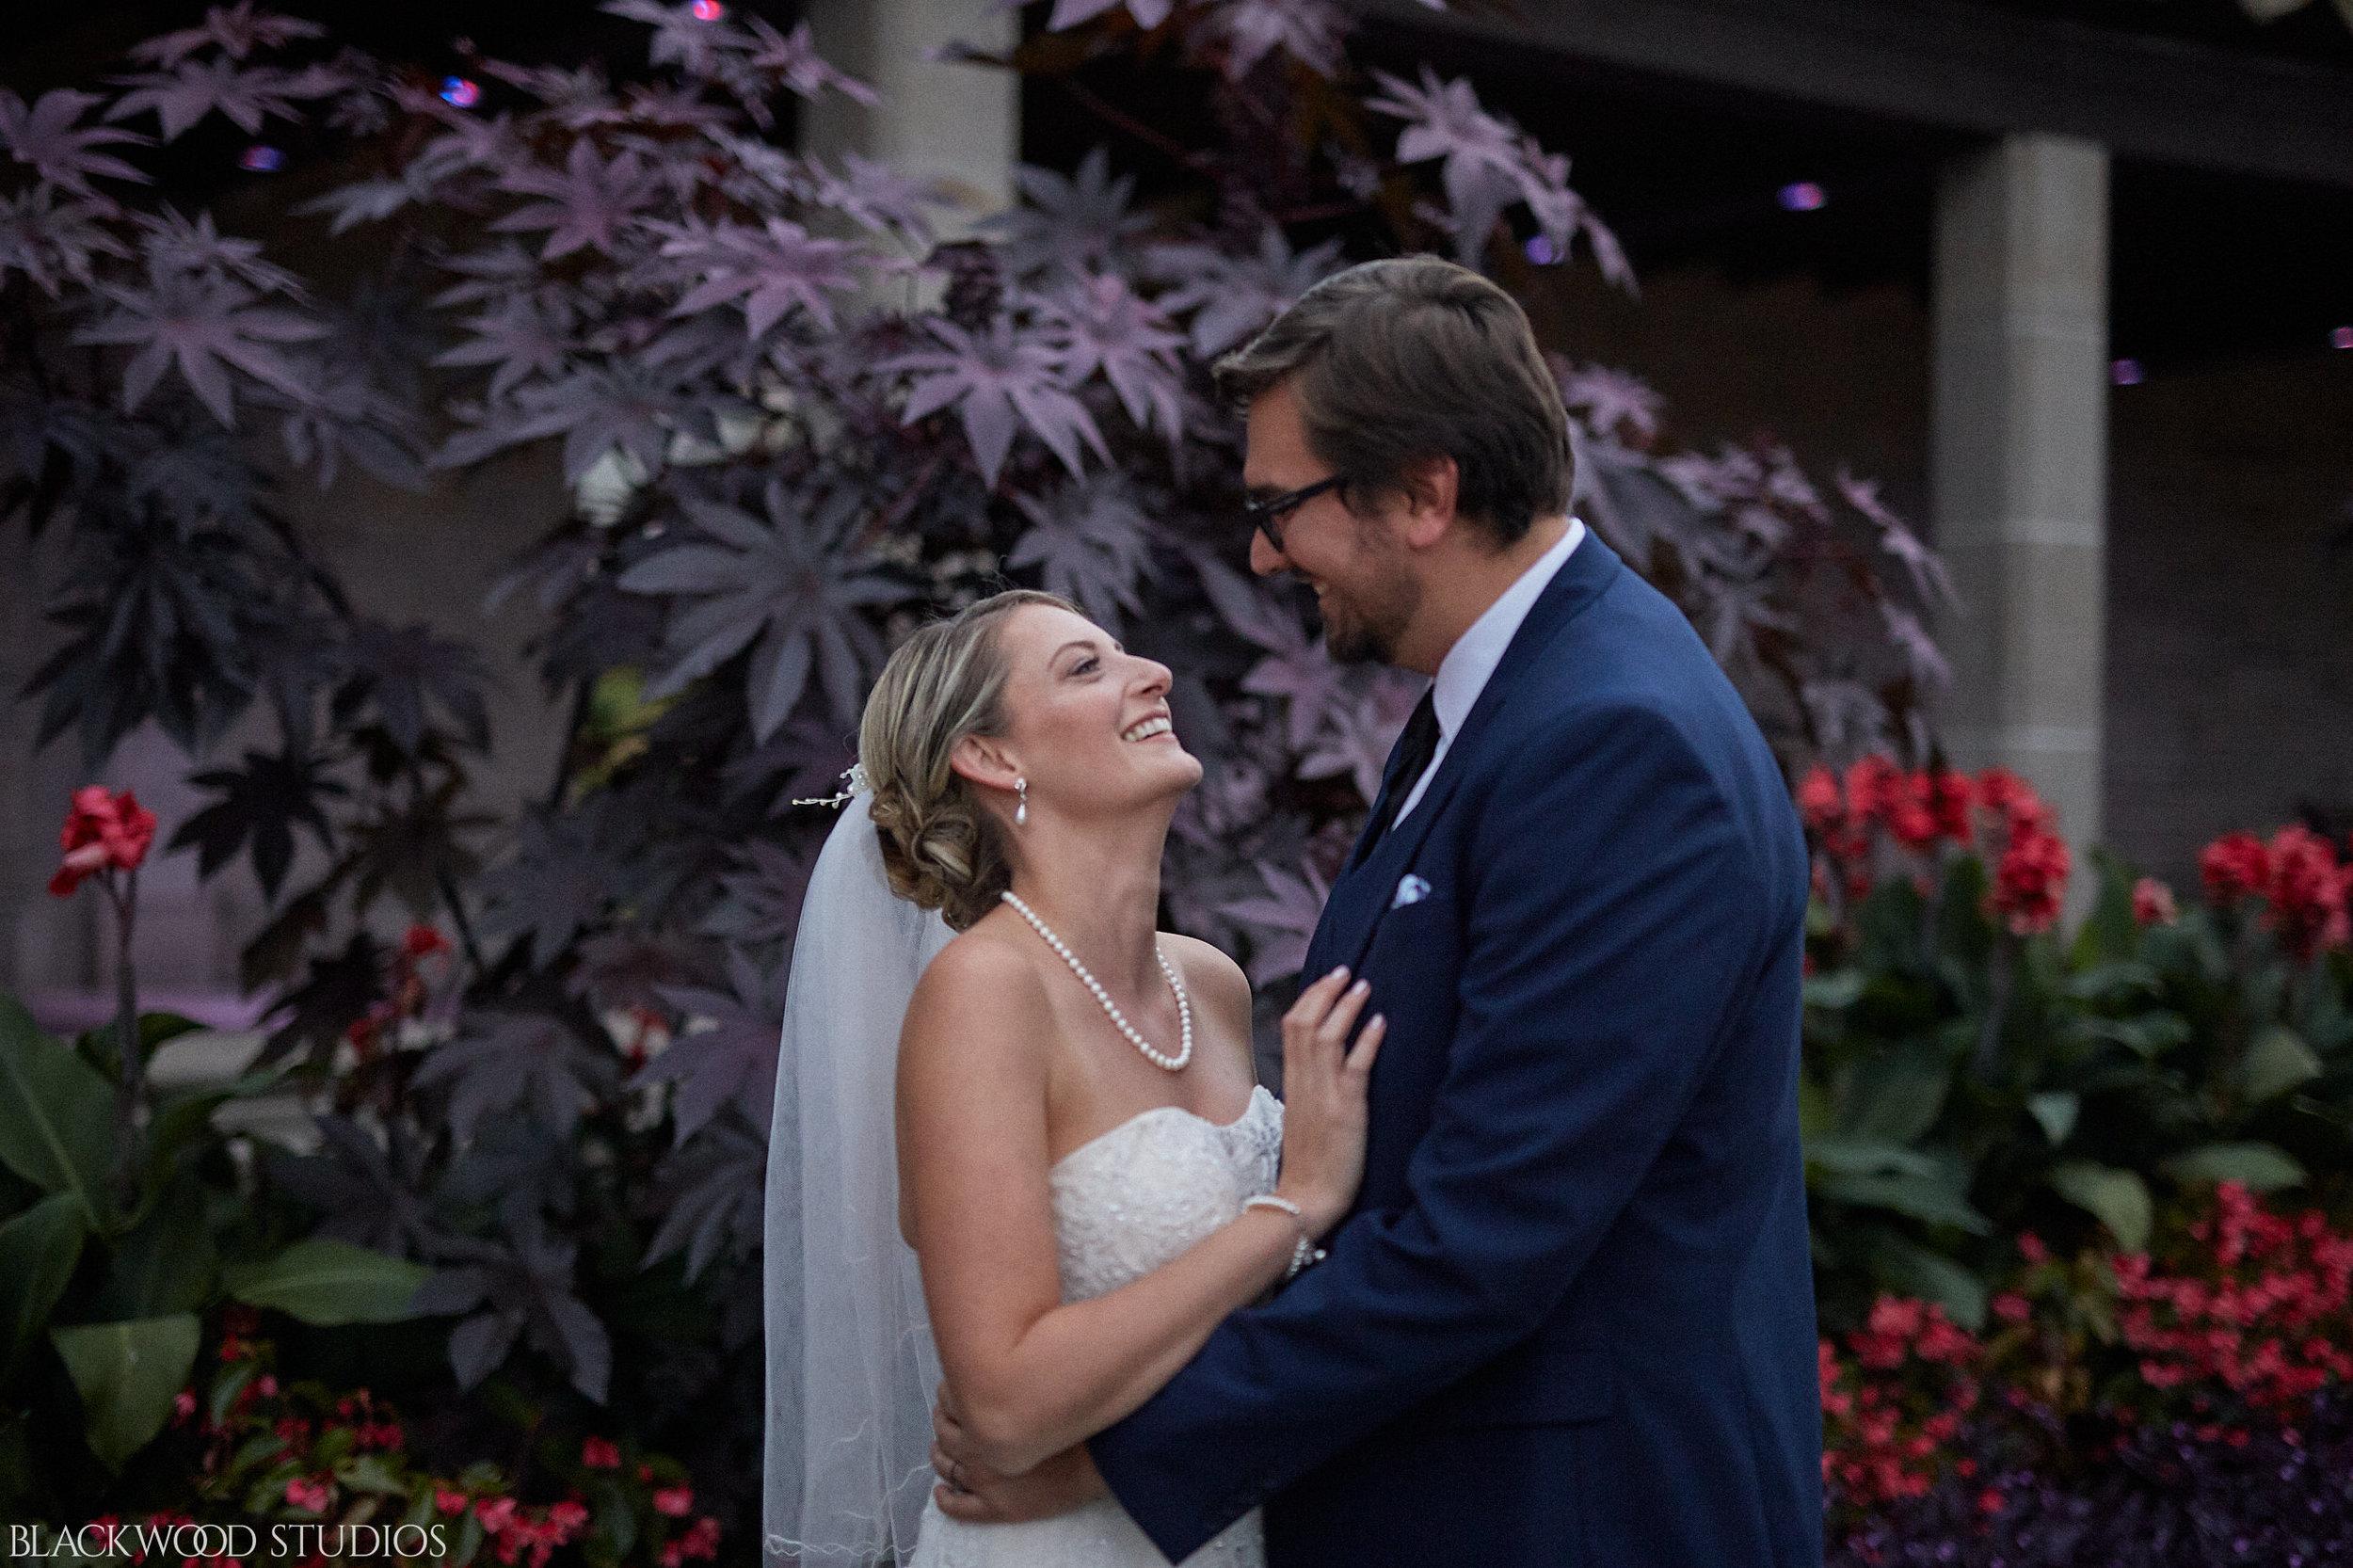 Blackwood-Studios-Wedding-Photography-20170928-185332-Marek-Katie-Michalek-Oakes-Garden-Theatre-Niagara-Falls-Ontario-Canada.jpg